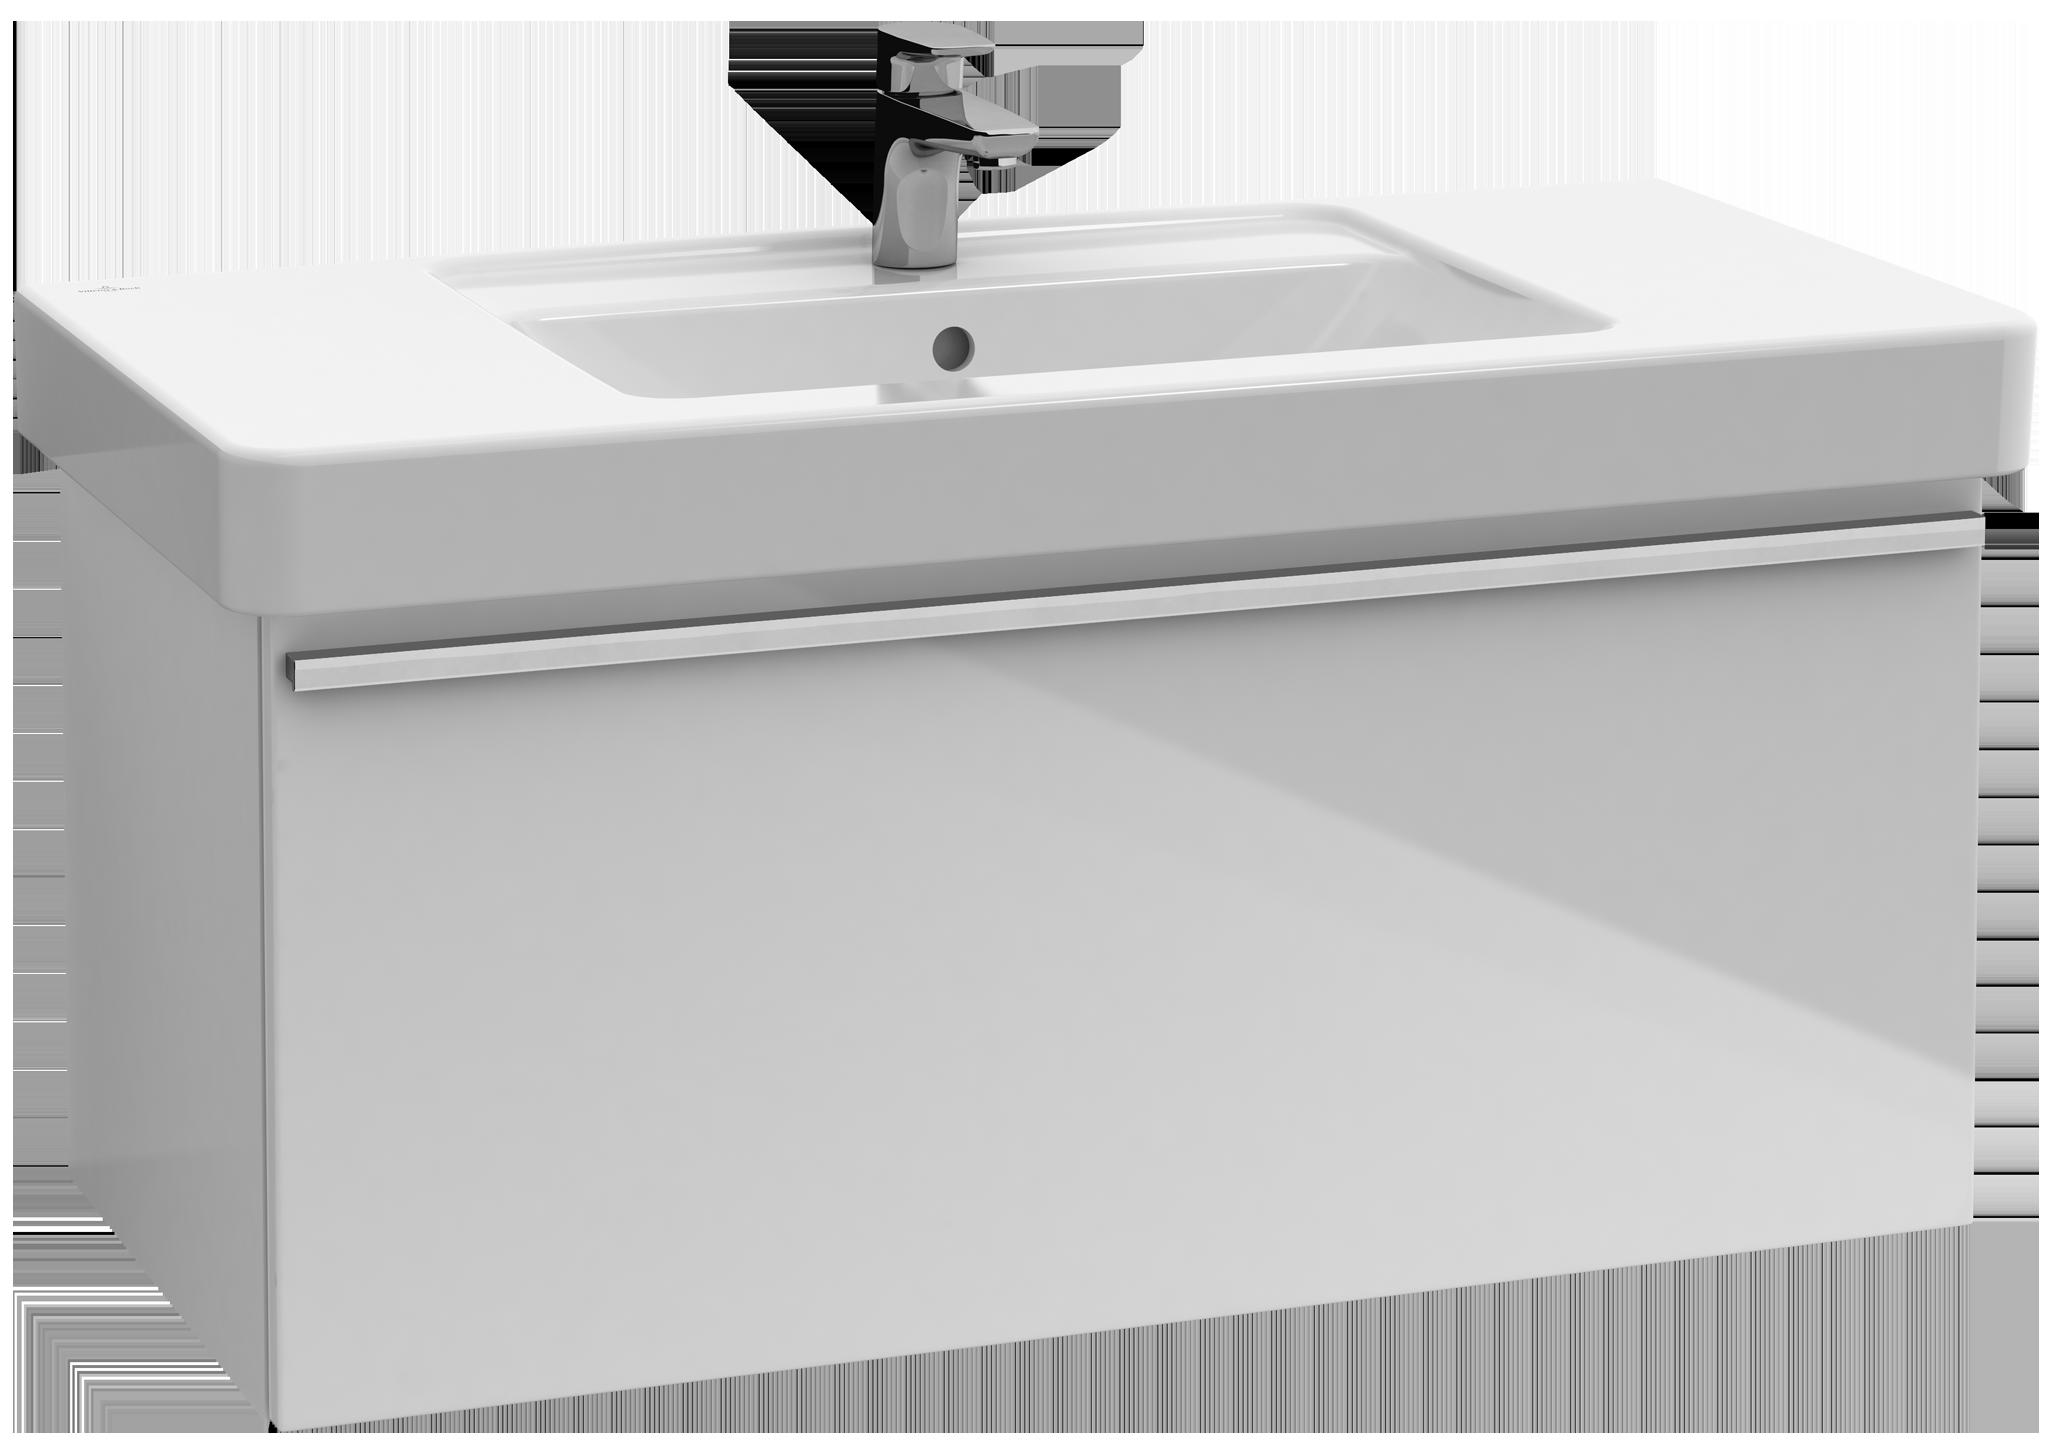 Central line meuble sous lavabo a273p2 villeroy boch for Meuble sous lavabo fly